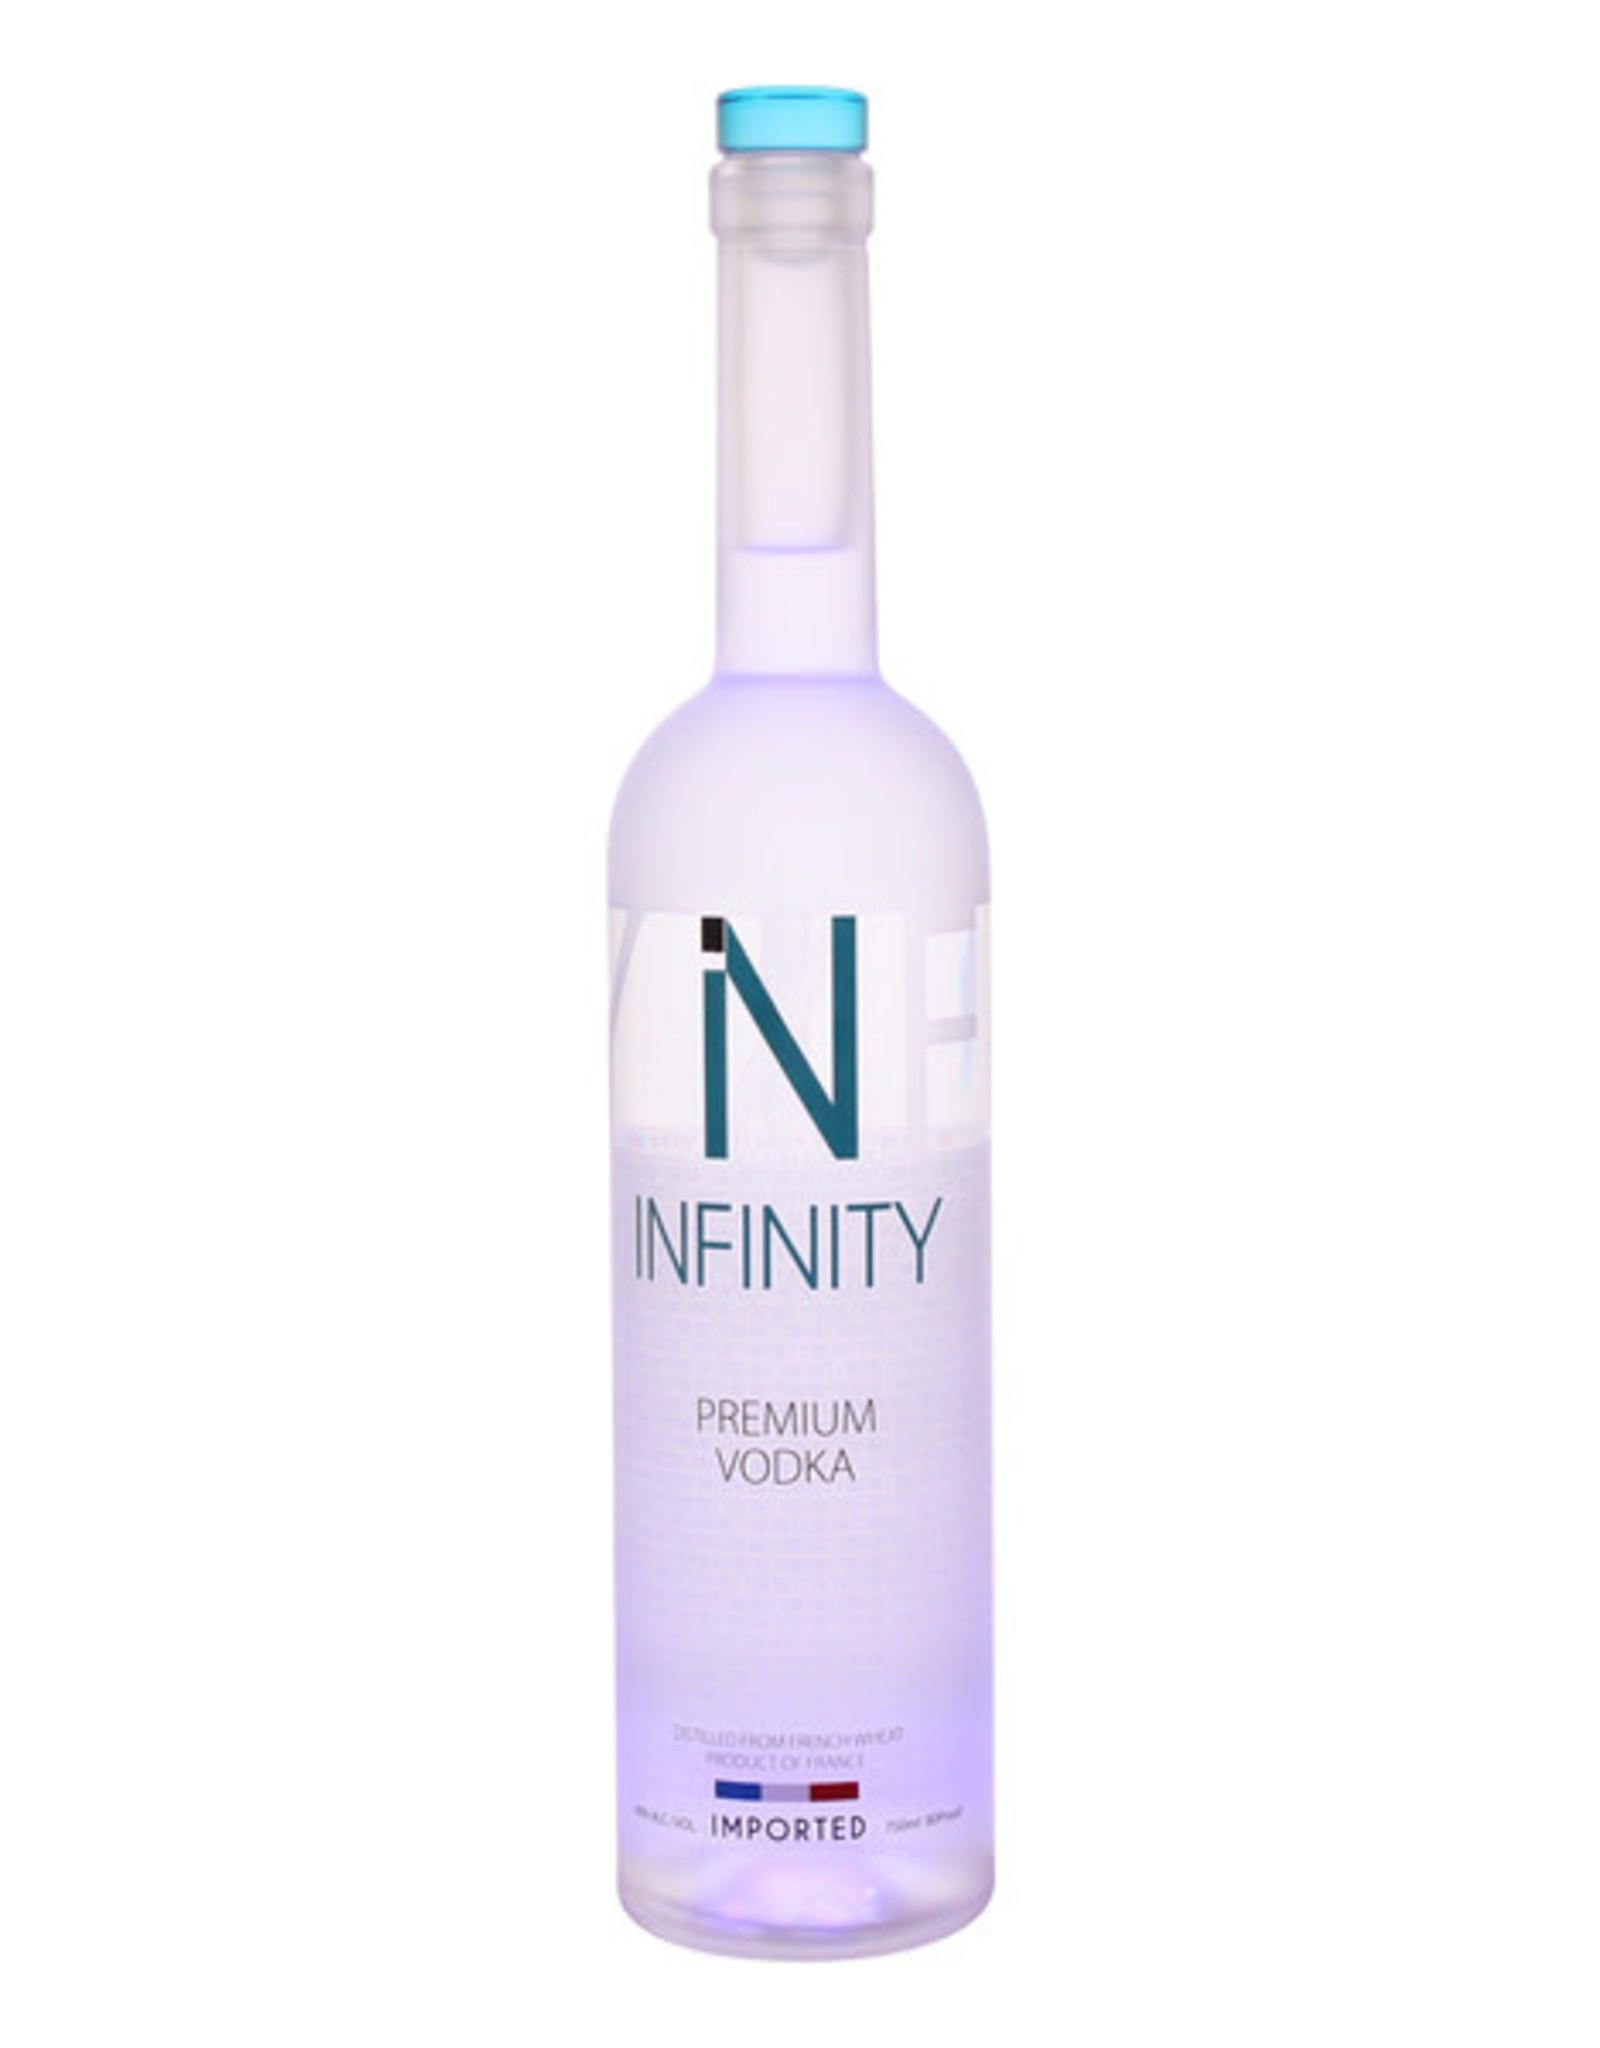 INFINITY PREMIUM VODKA 750ml